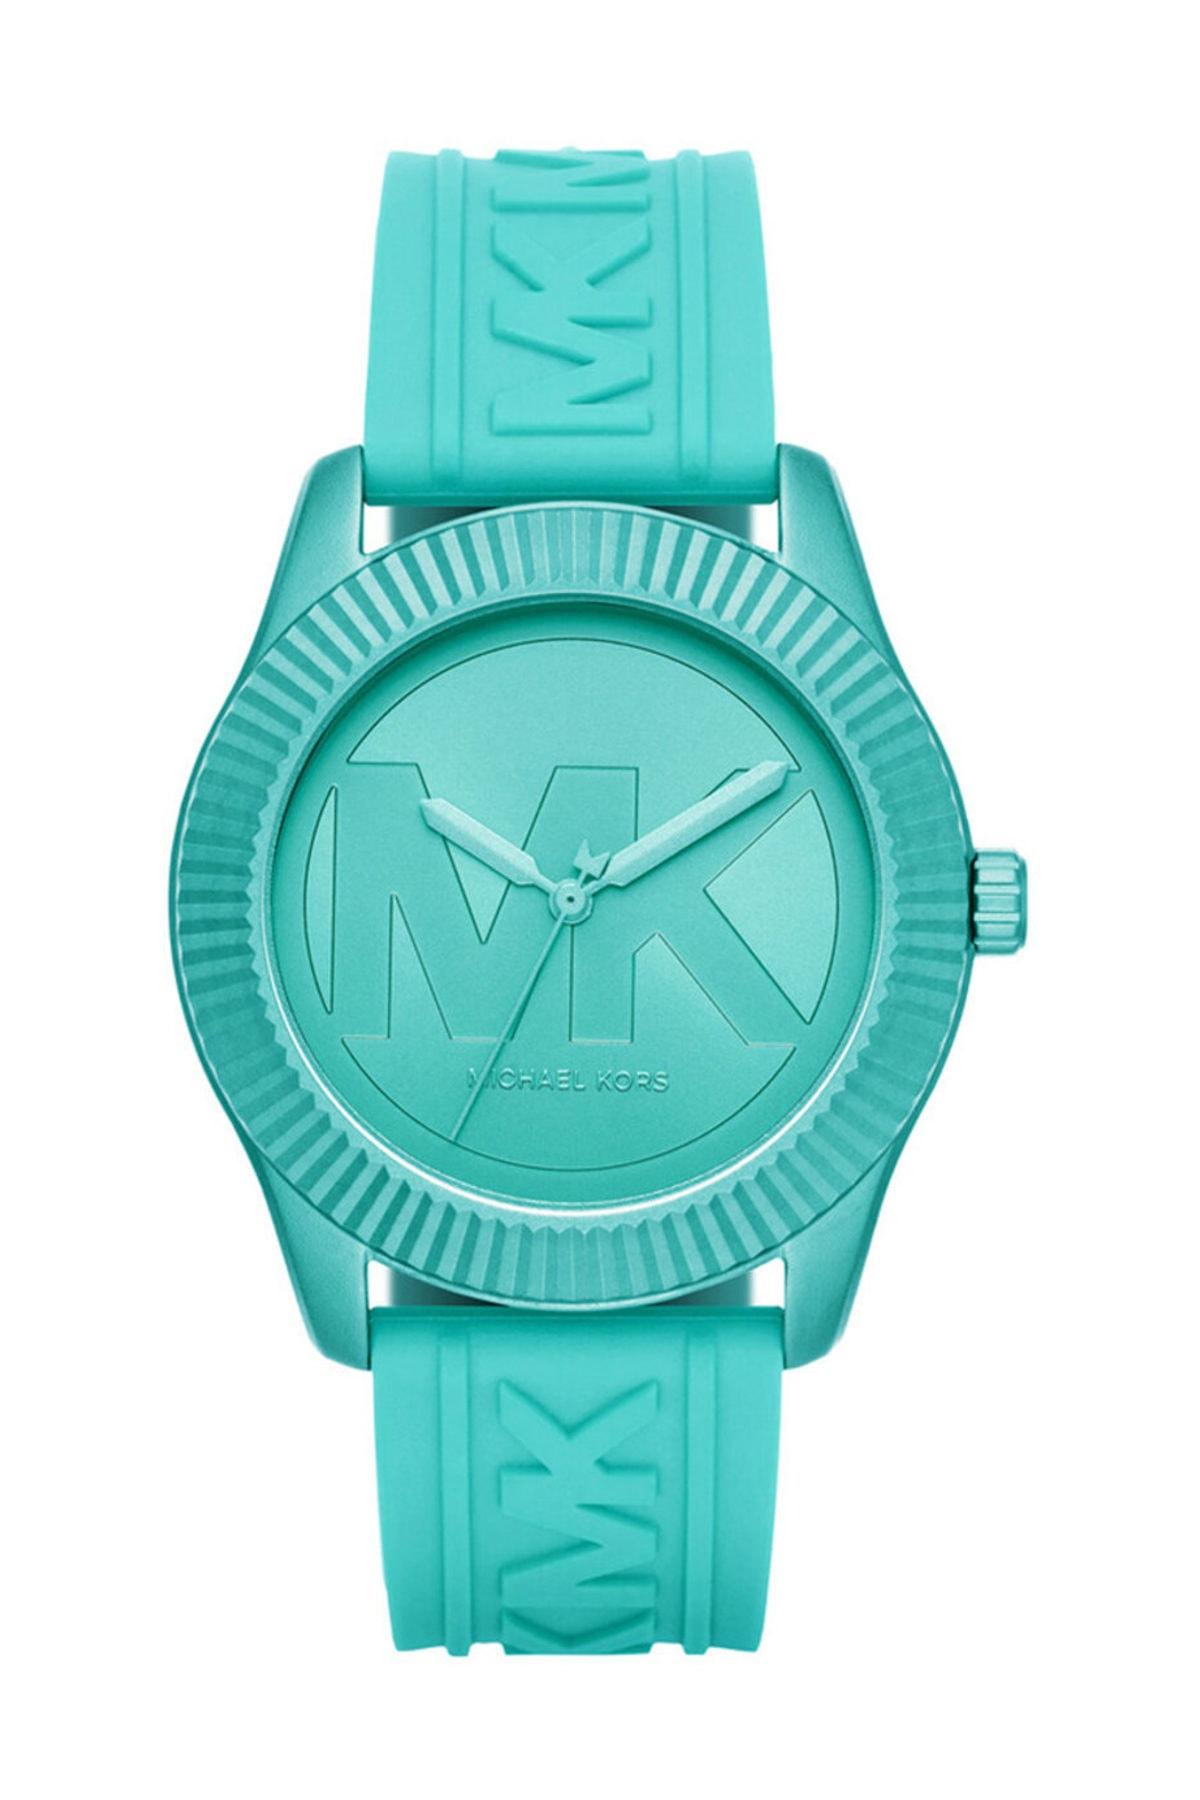 Michael Kors MK6804 Kadın Kol Saati 1